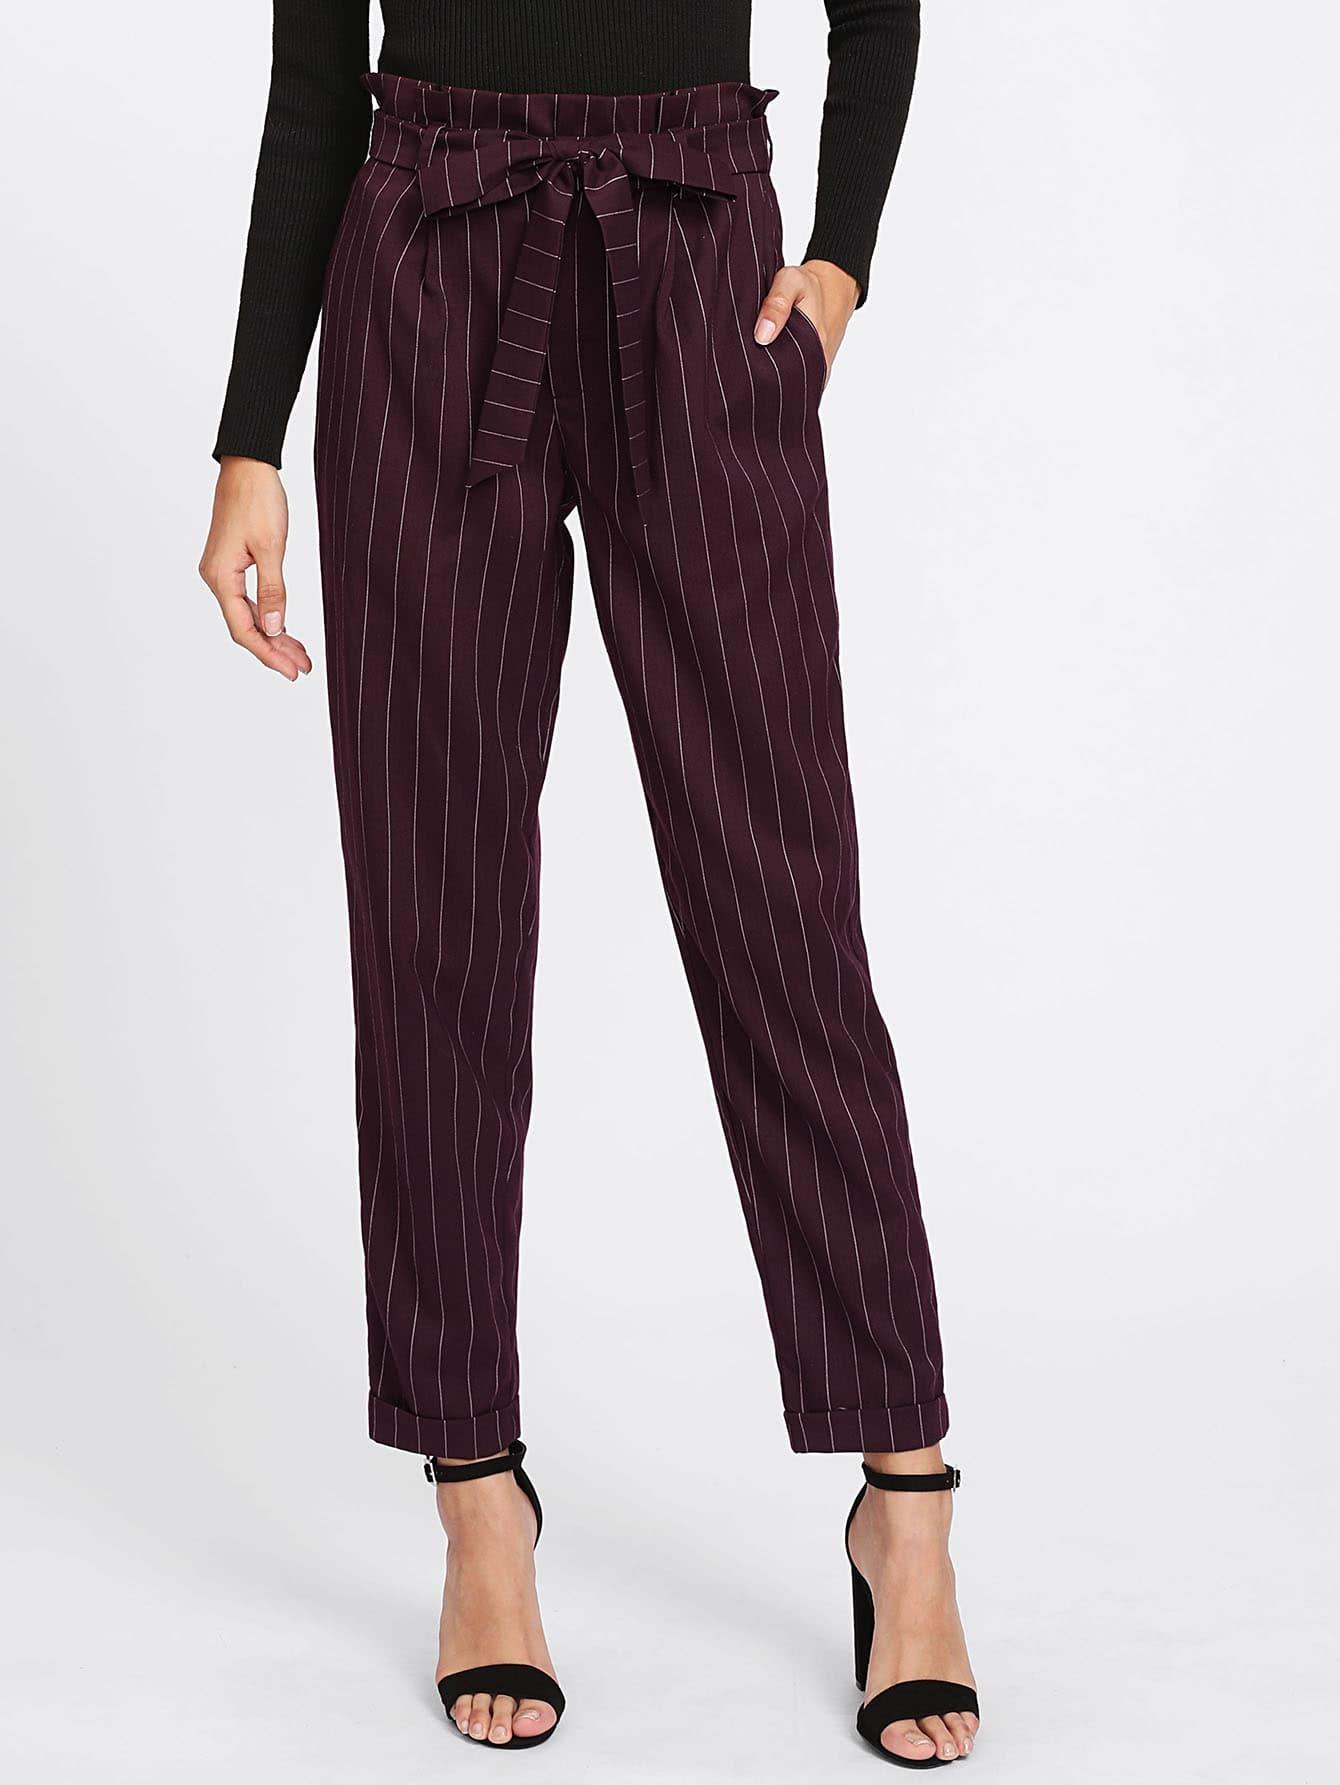 Tie Waist Cuffed Pinstripe Peg Pants ruffle waist belted peg pants